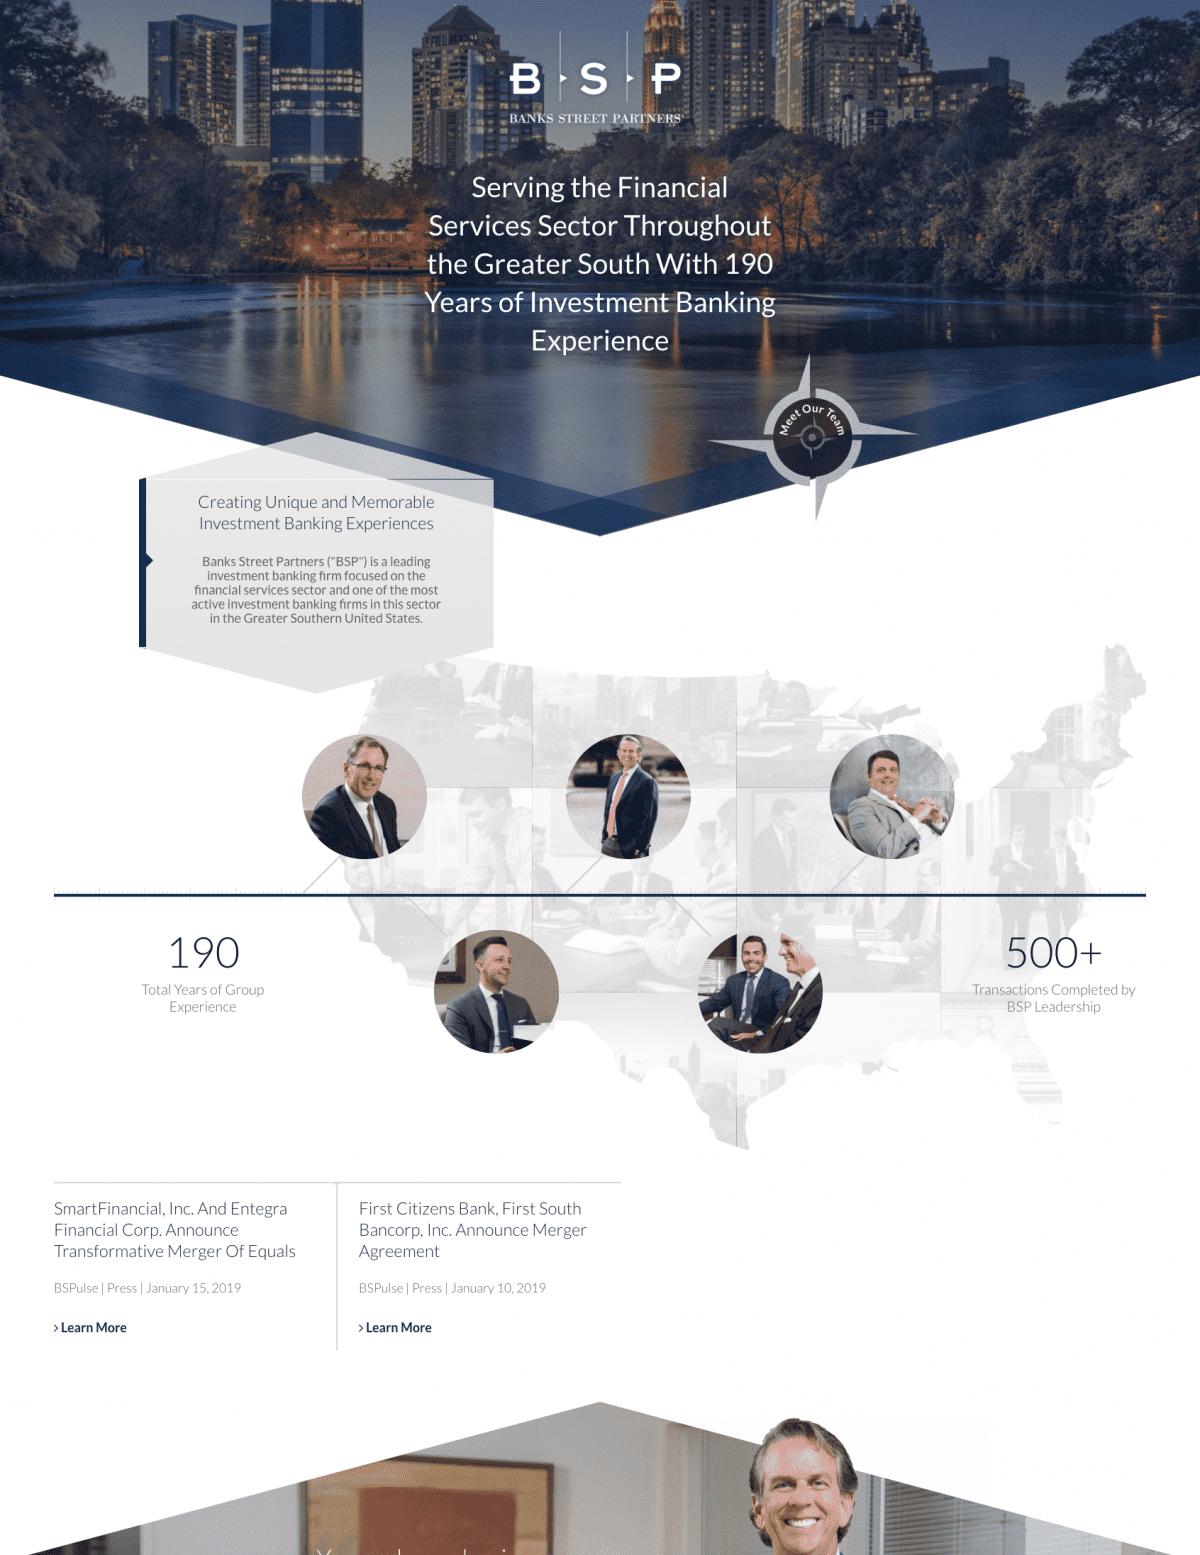 Image of website for Banks Street Partners